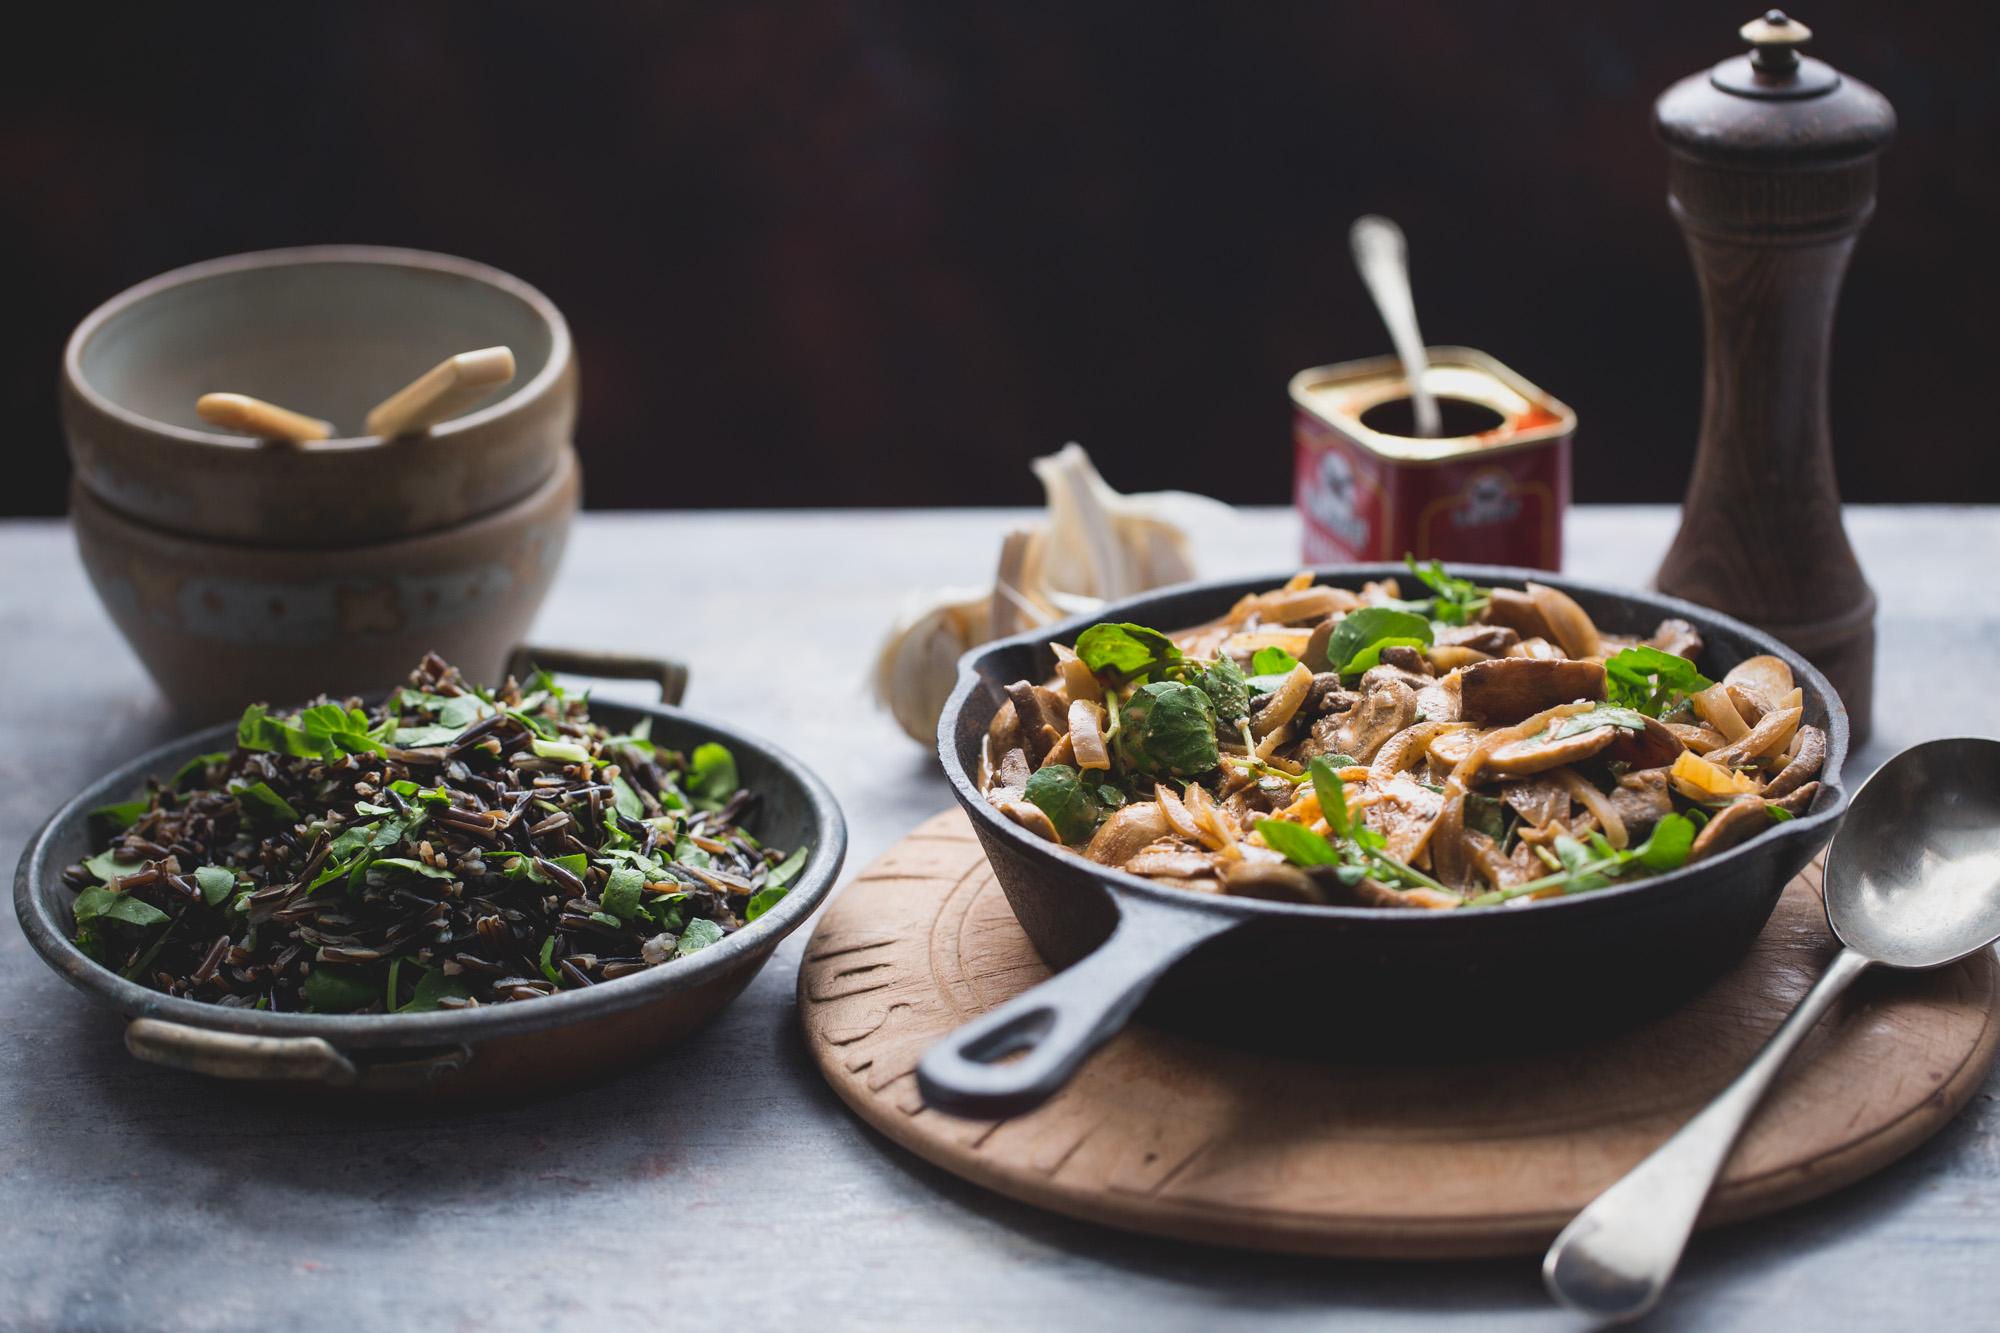 Supper, Dorset - Food photographer